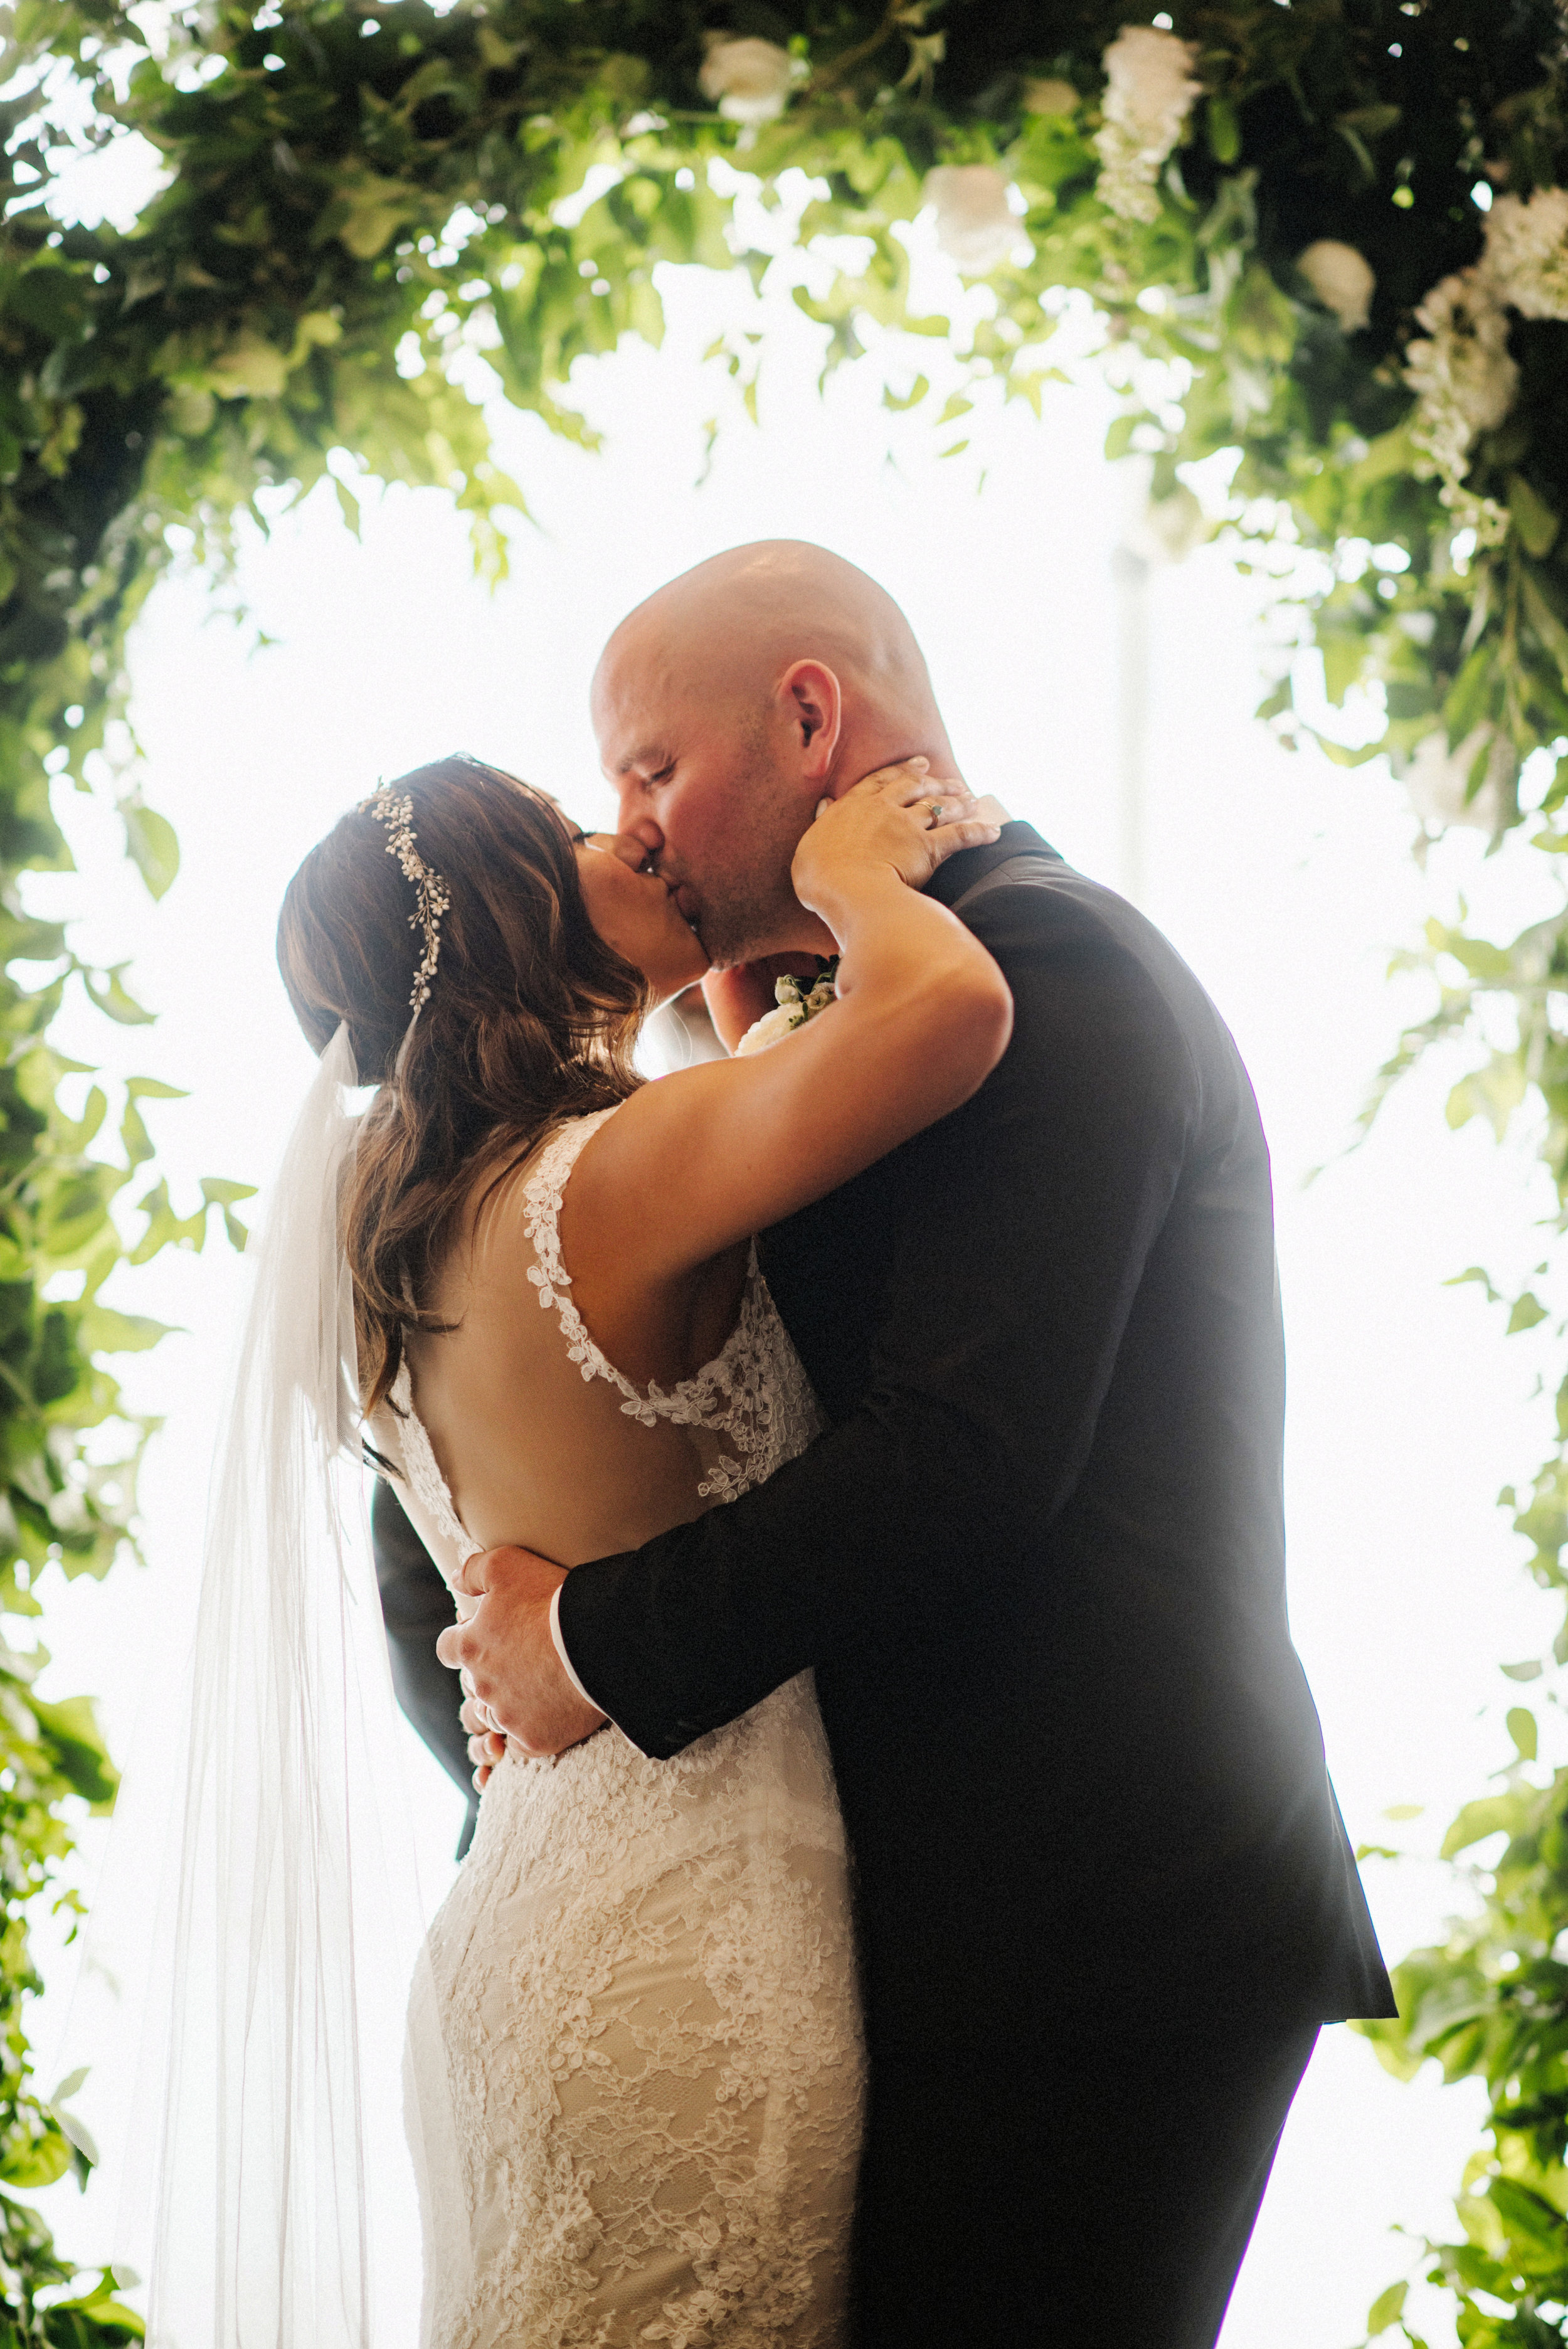 erintommy-four-seasons-seattle-wedding-ryan-flynn-photography-ceremony-0145.JPG